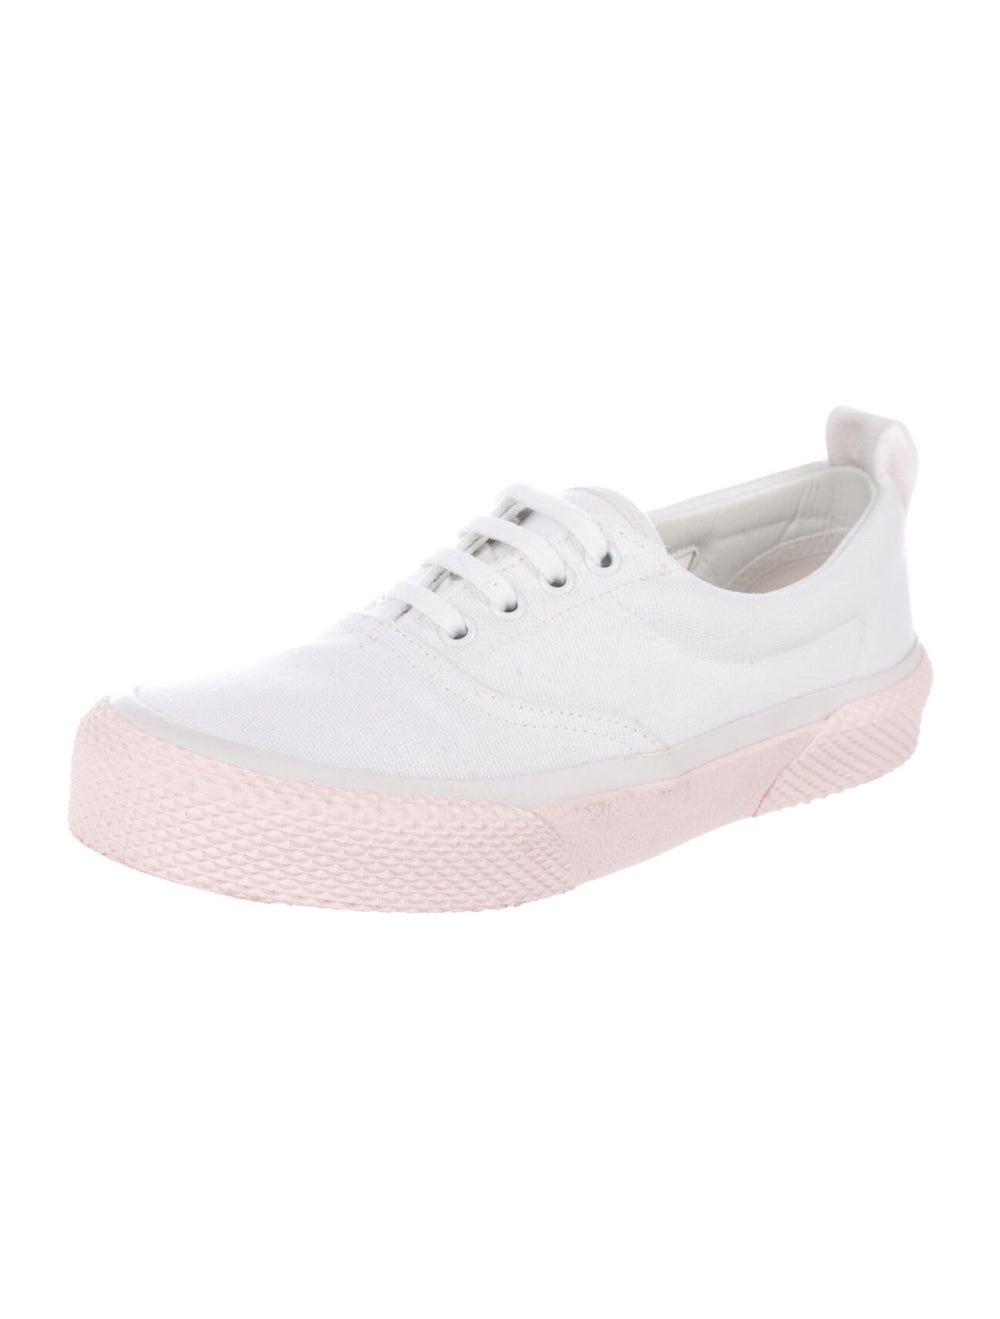 Celine 180 Sneakers White - image 2